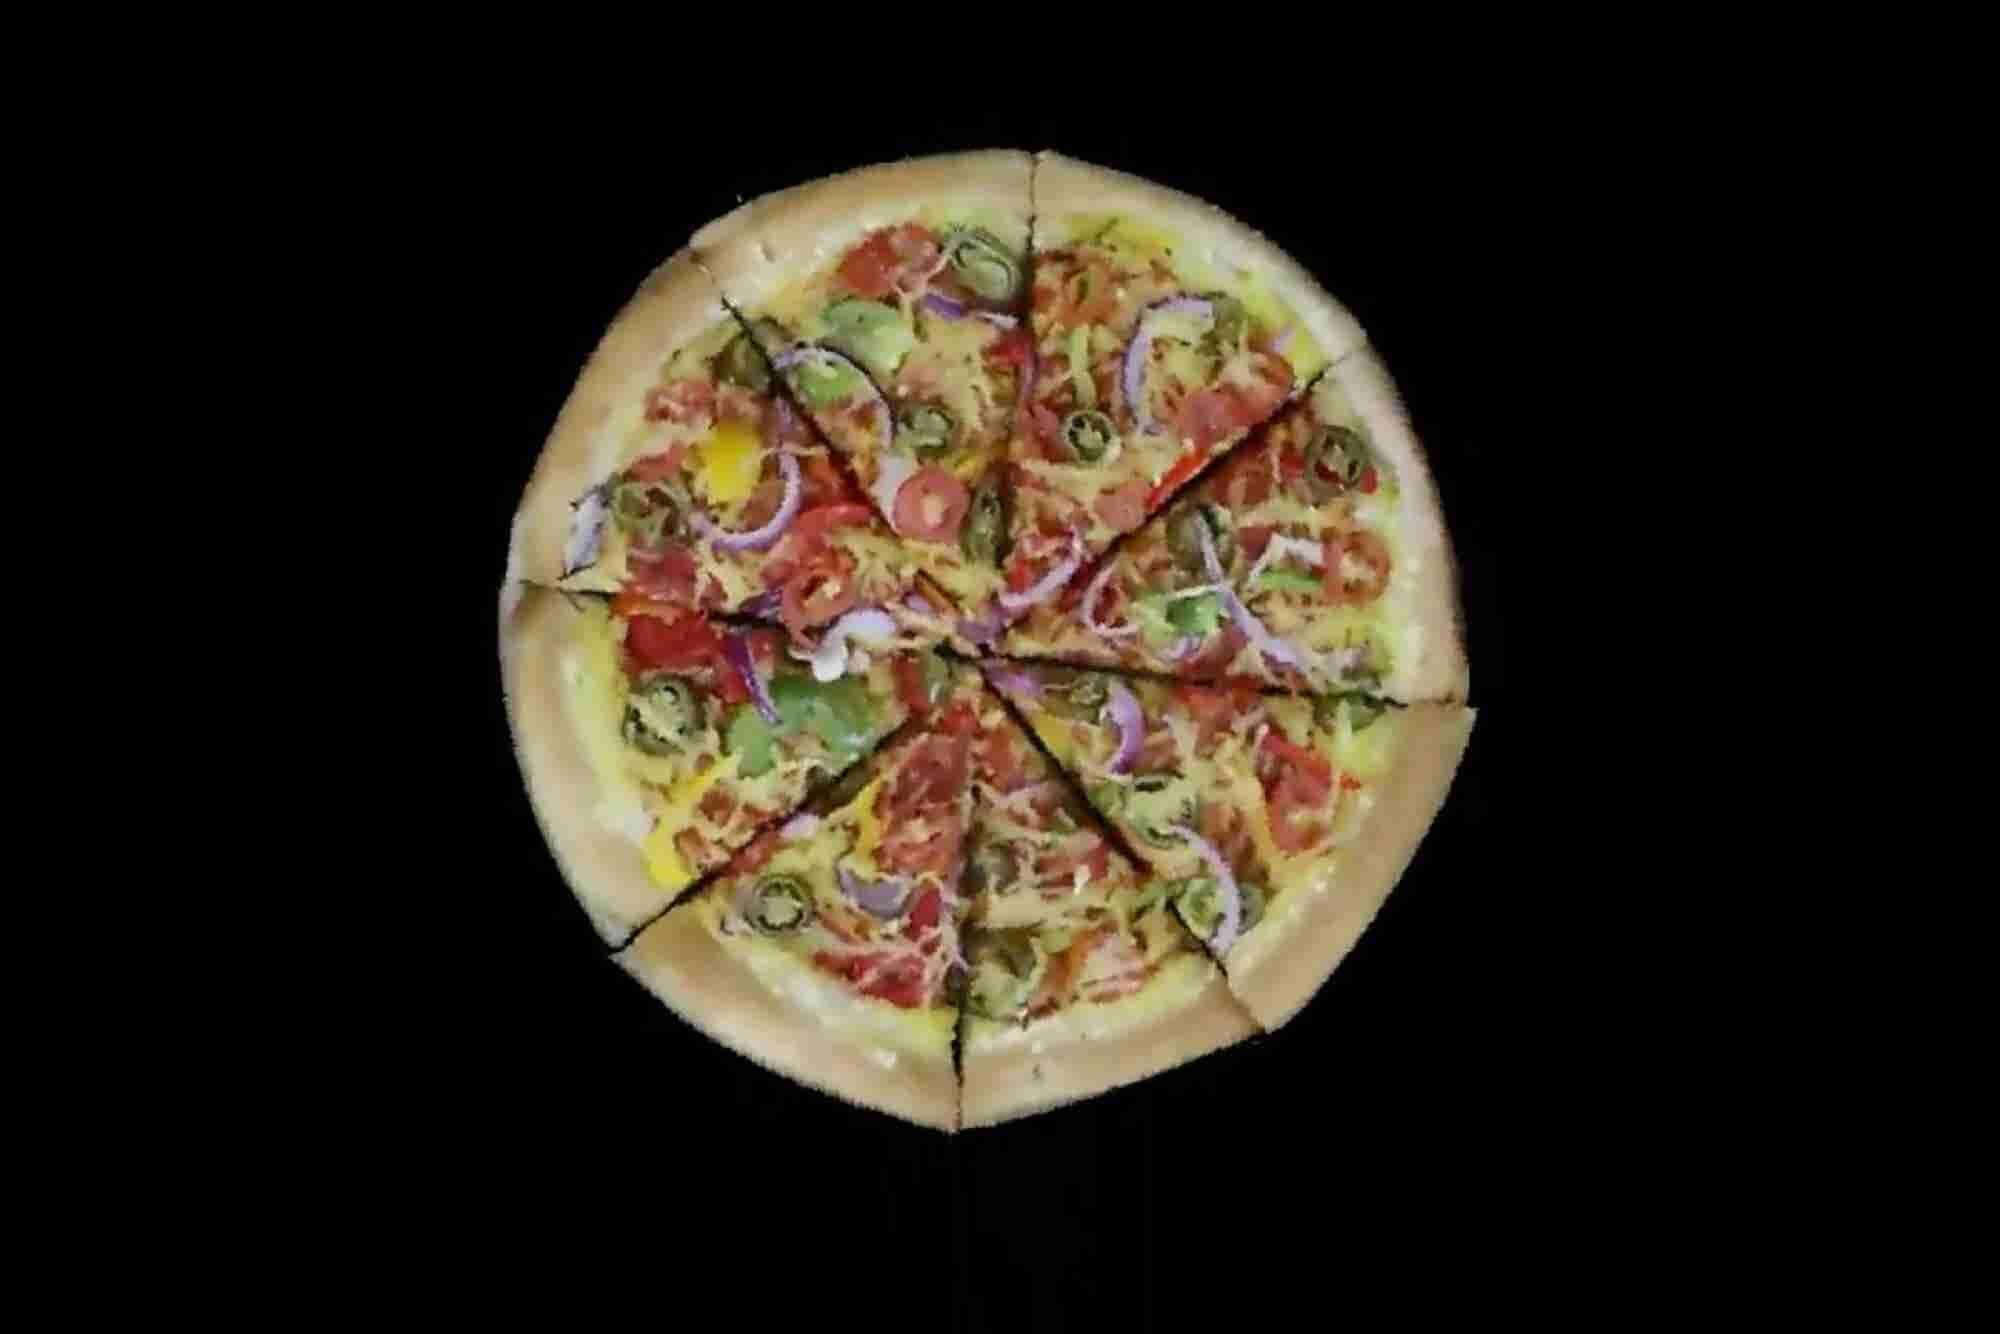 Pizza Hut Now Has a Vegan Pizza